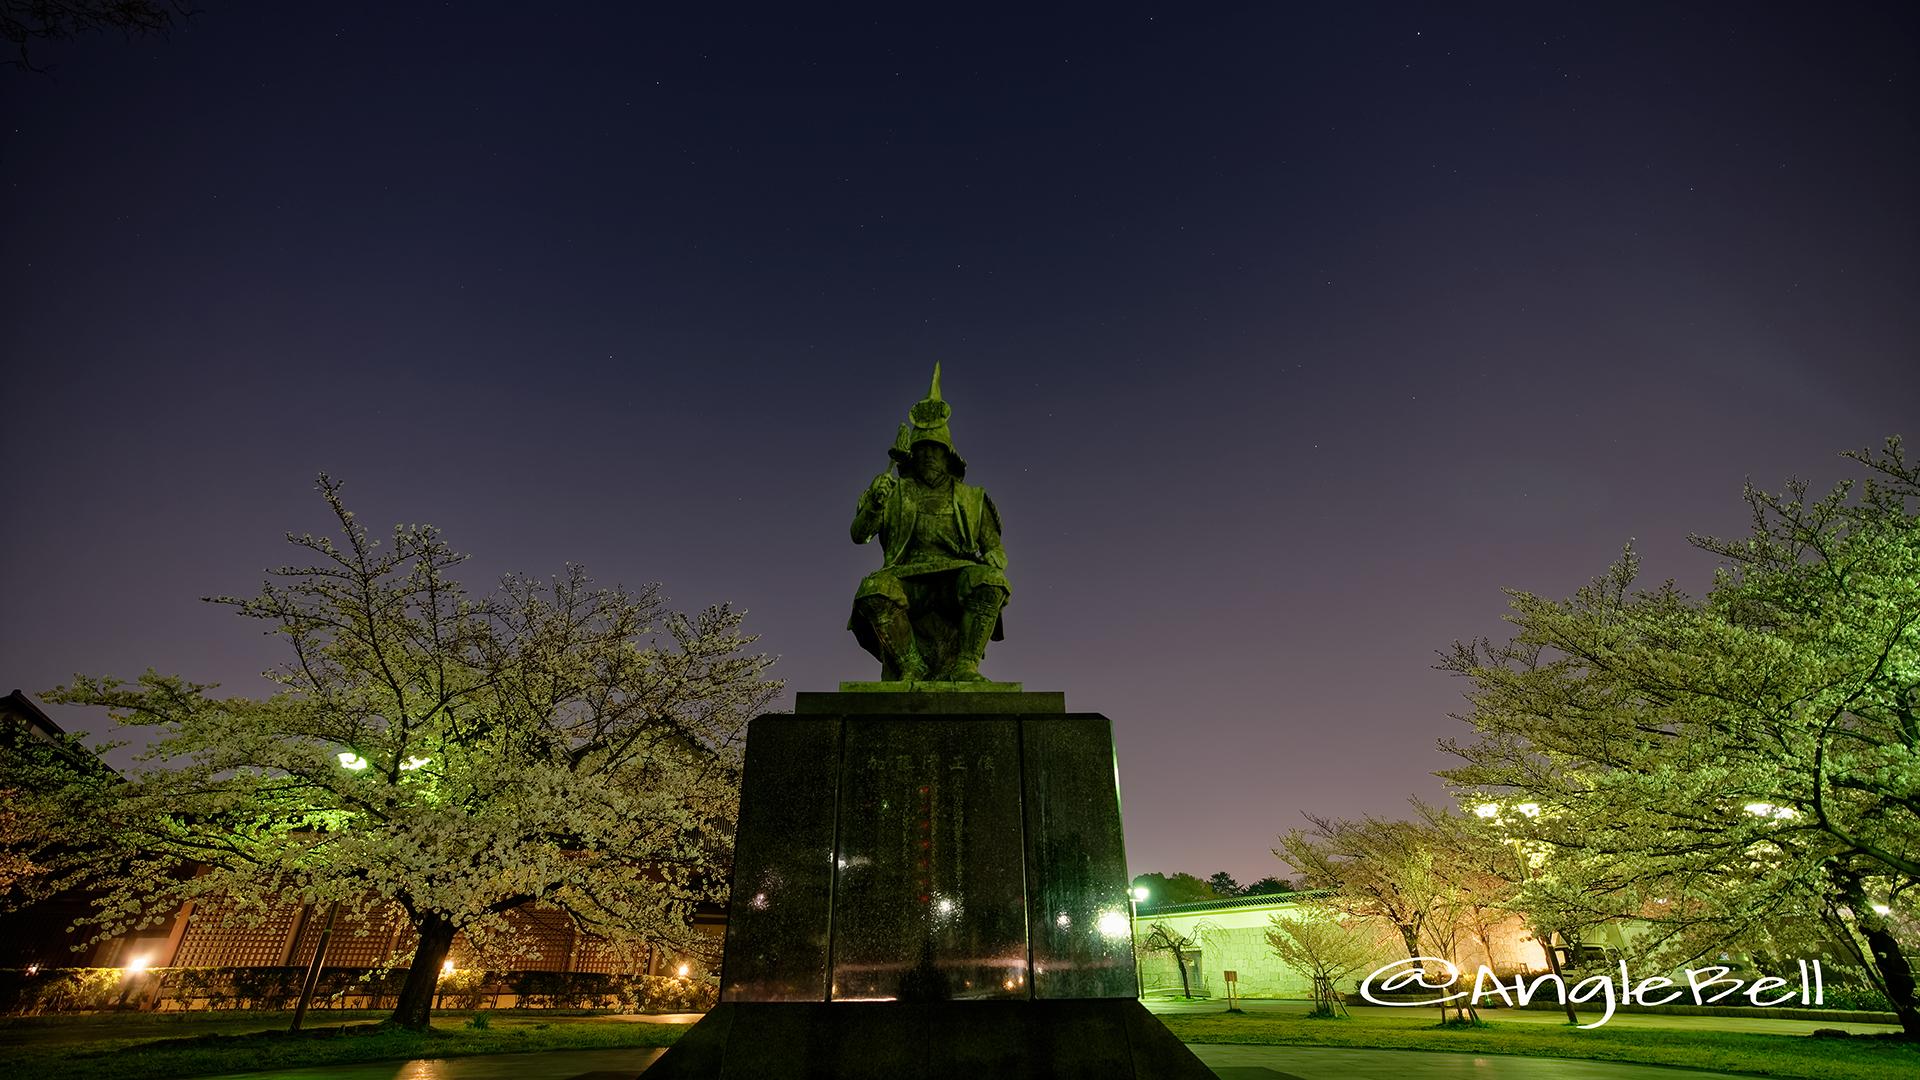 夜景 名城公園 加藤清正像と桜 March 2018